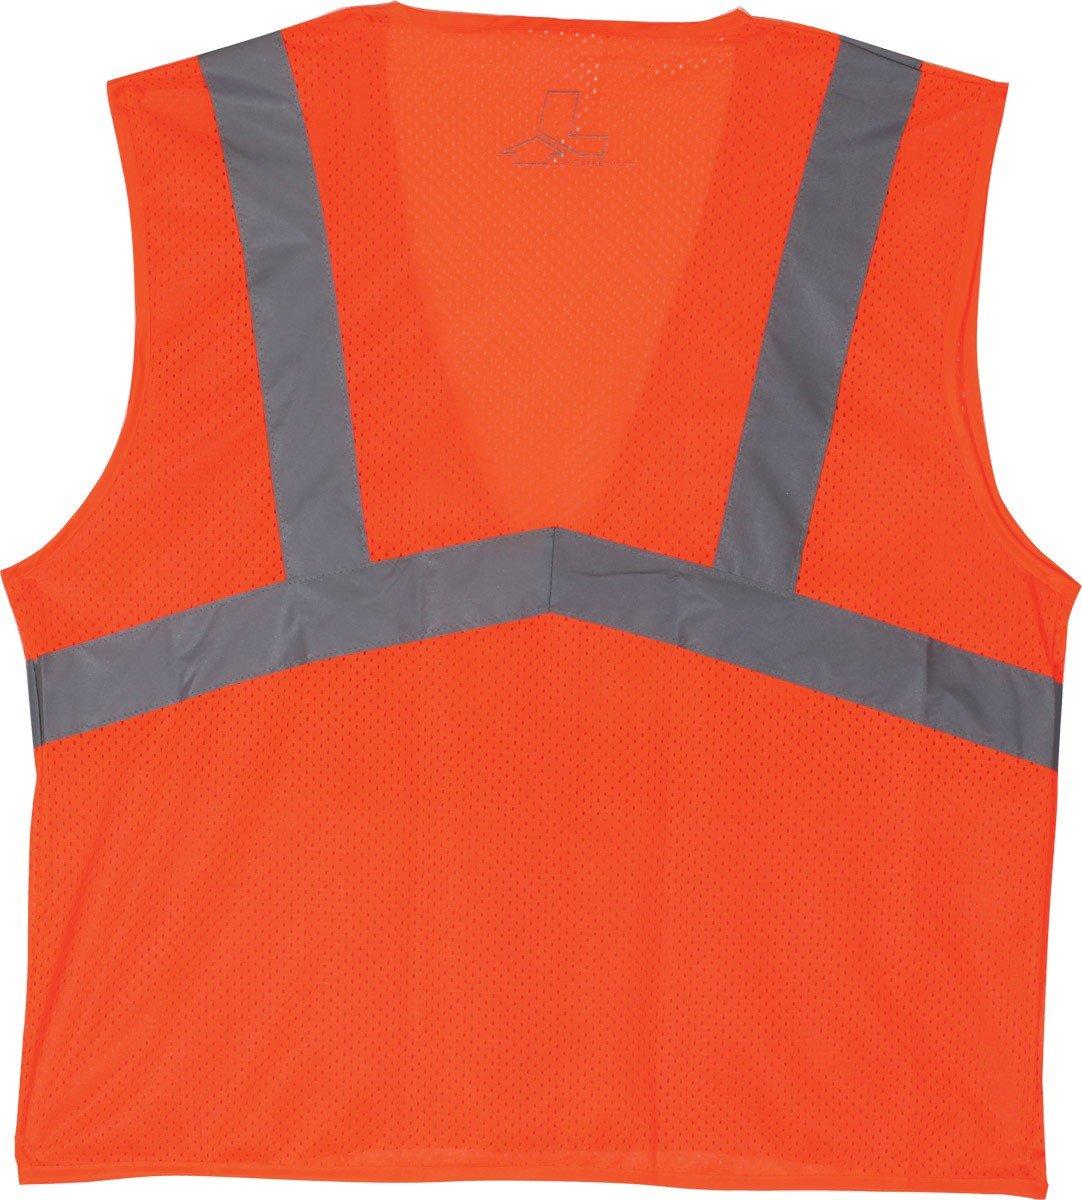 Orange, XXXX-Large LIFT Safety Viz-Pro 5-Point Break Away Vest AV5-13E4L